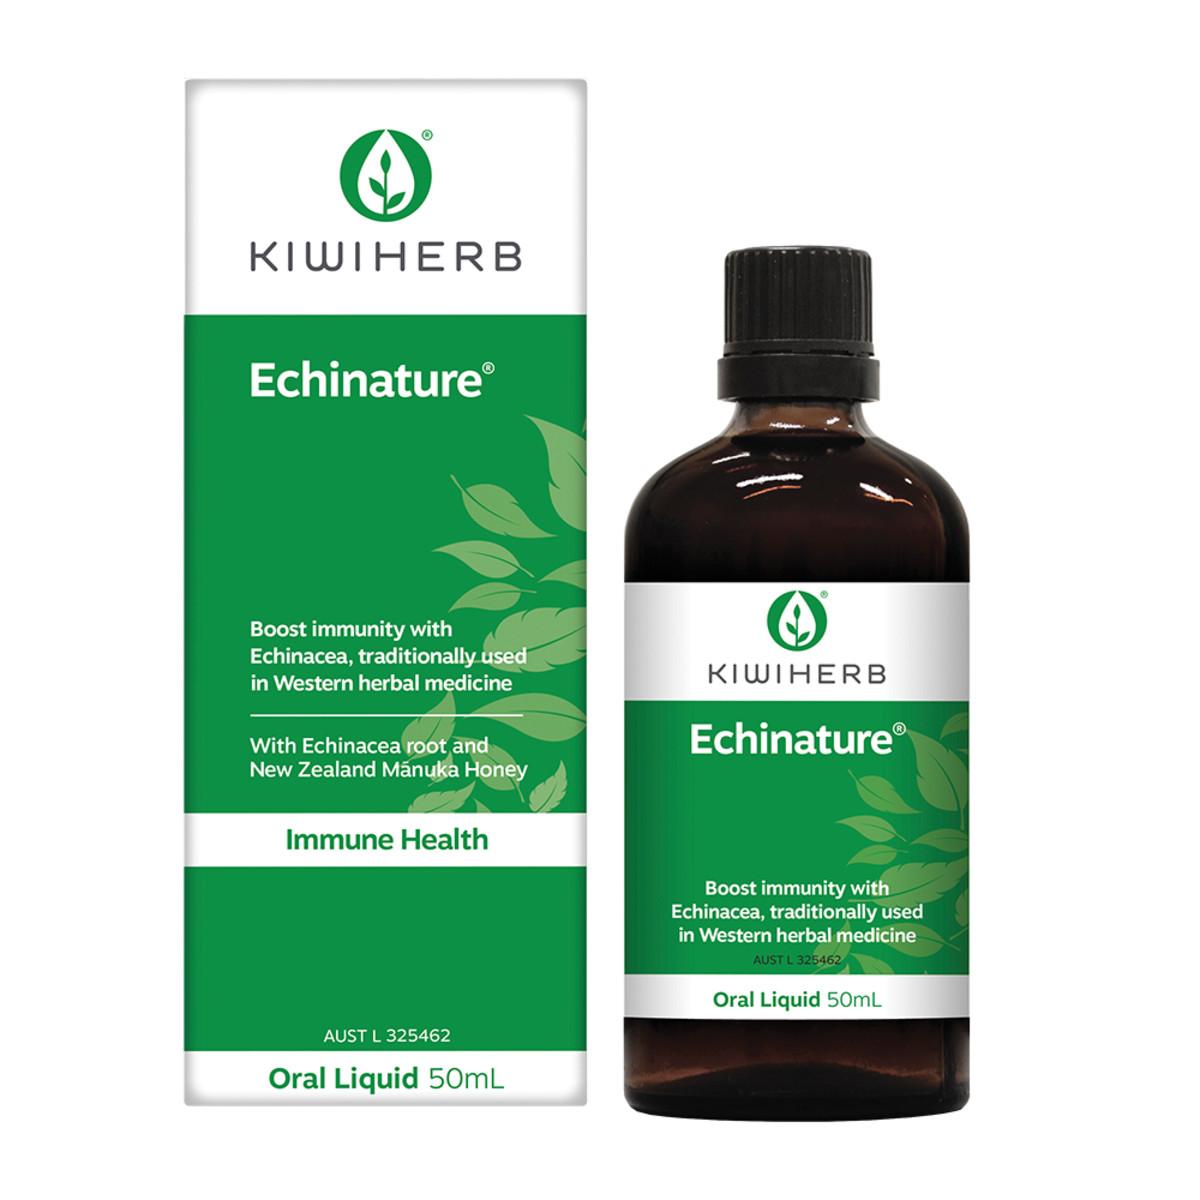 KiwiHerb Echinature 50ml_media-01